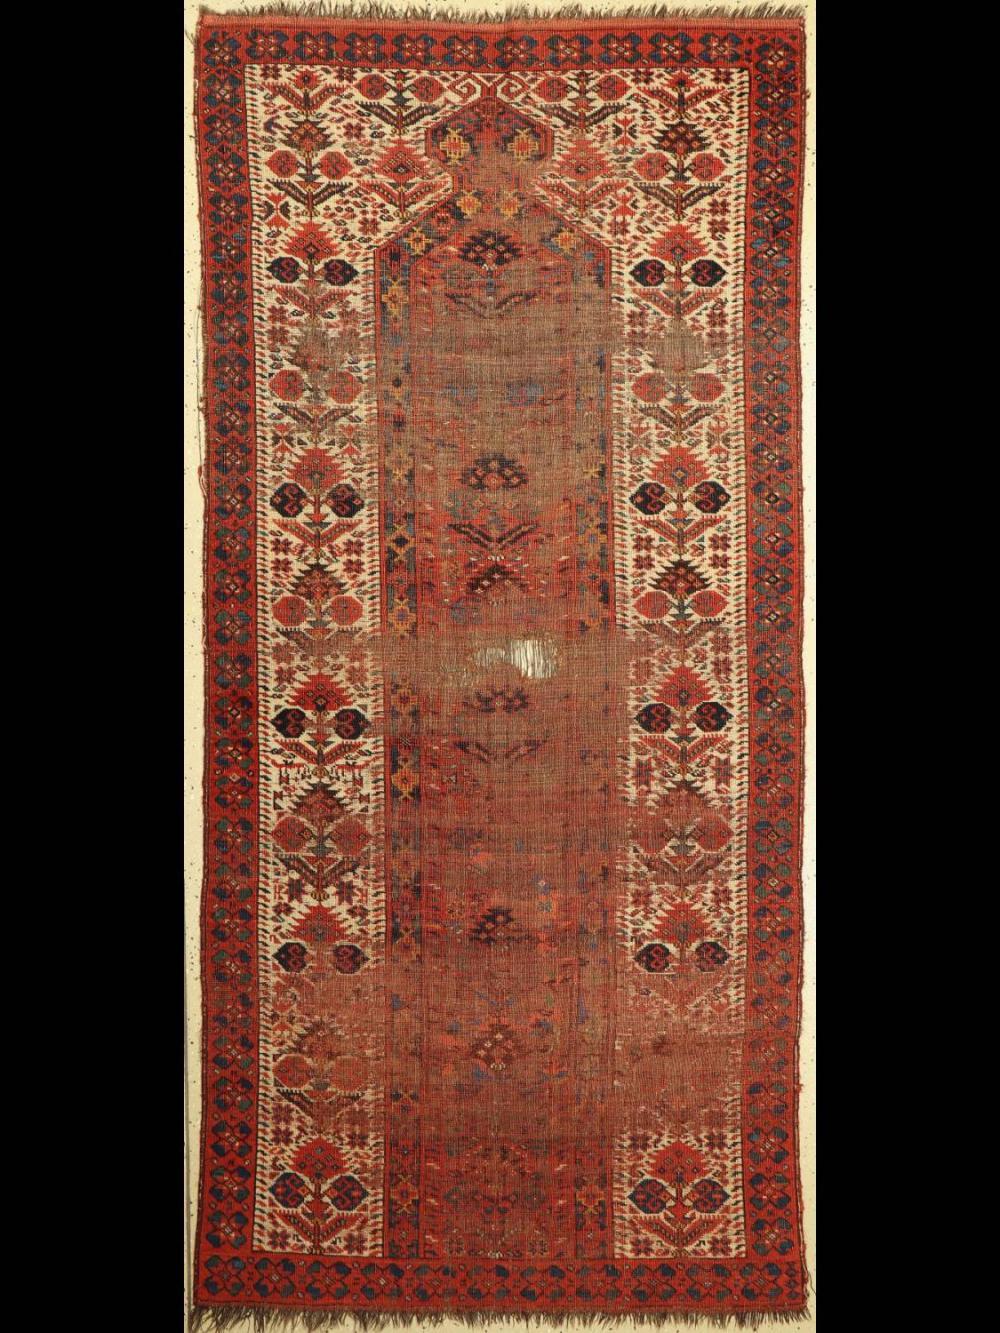 Beschir Engsi antique, Turkmenistan, mid 19th century